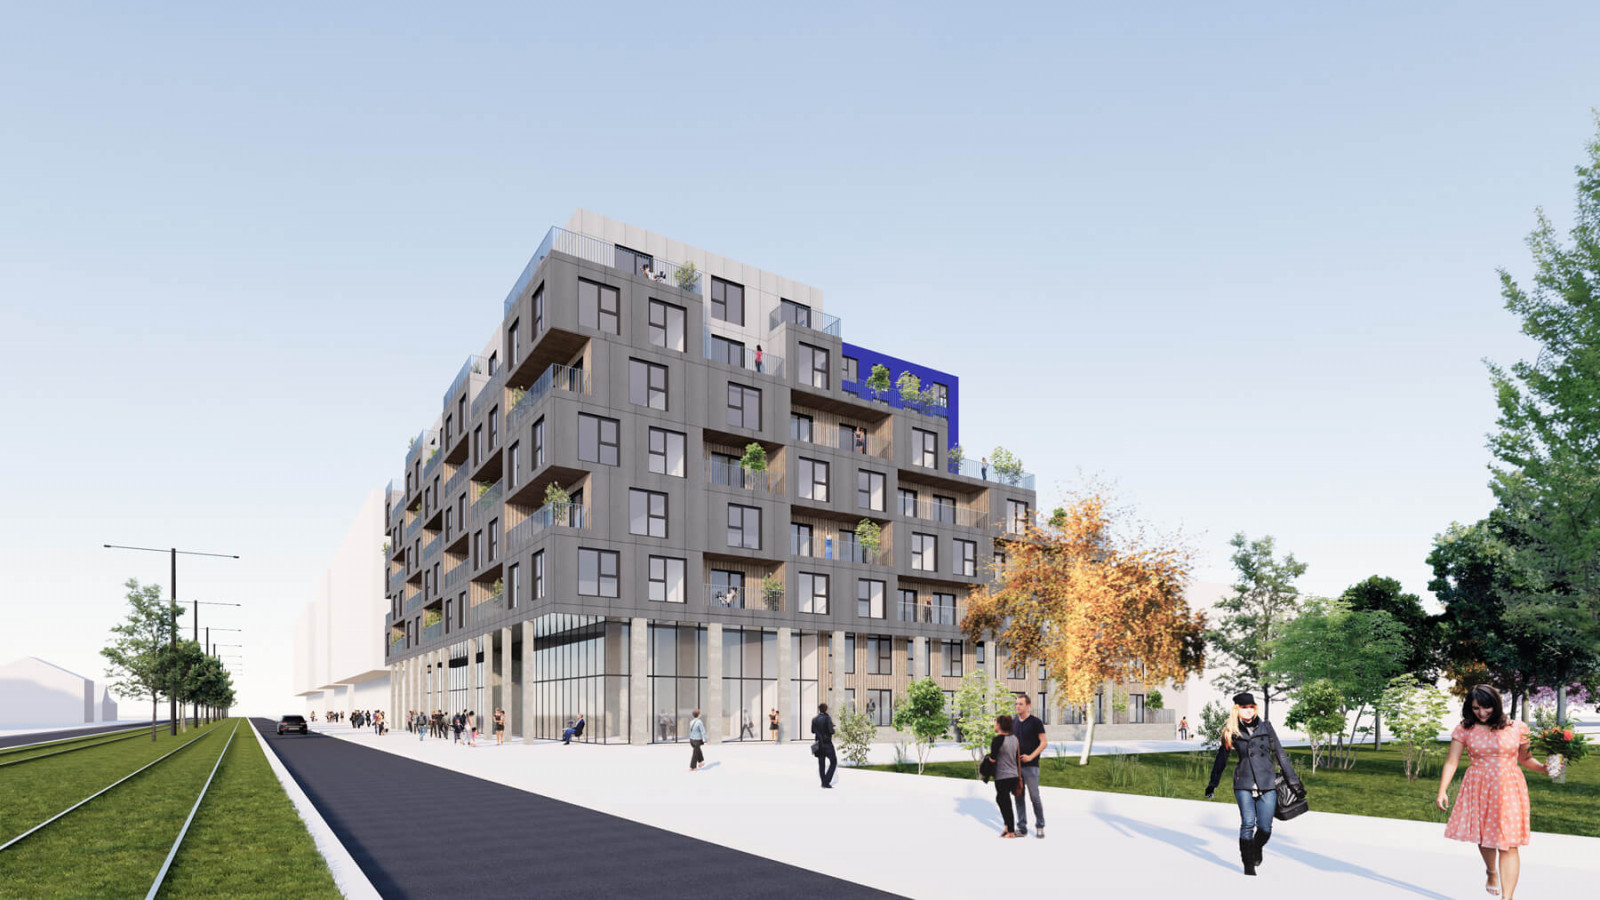 graam-avenue-1-01-logements-dijon-exterieur-rue-facade-loggia-commerce